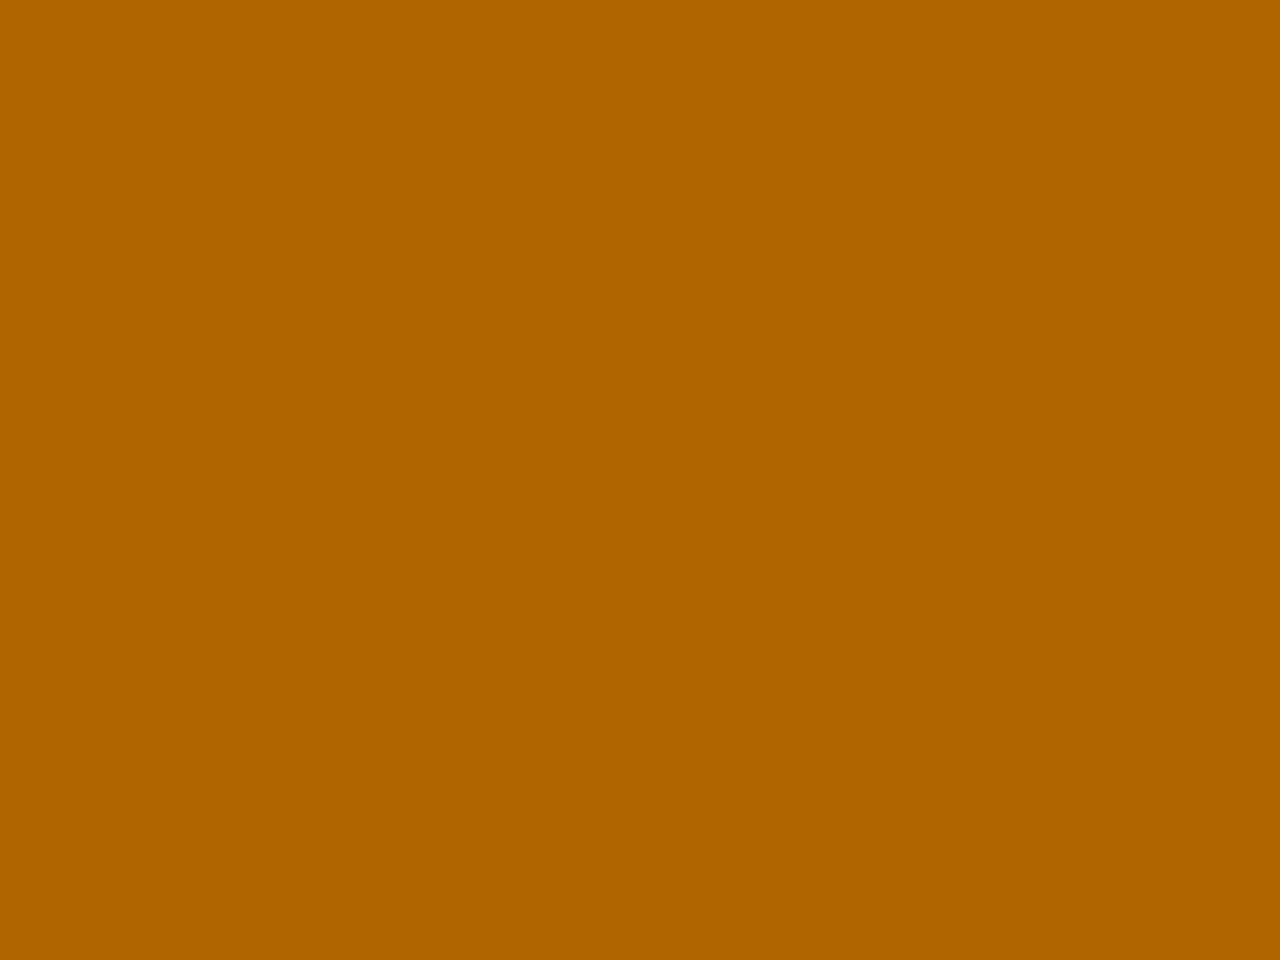 1280x960 Ginger Solid Color Background